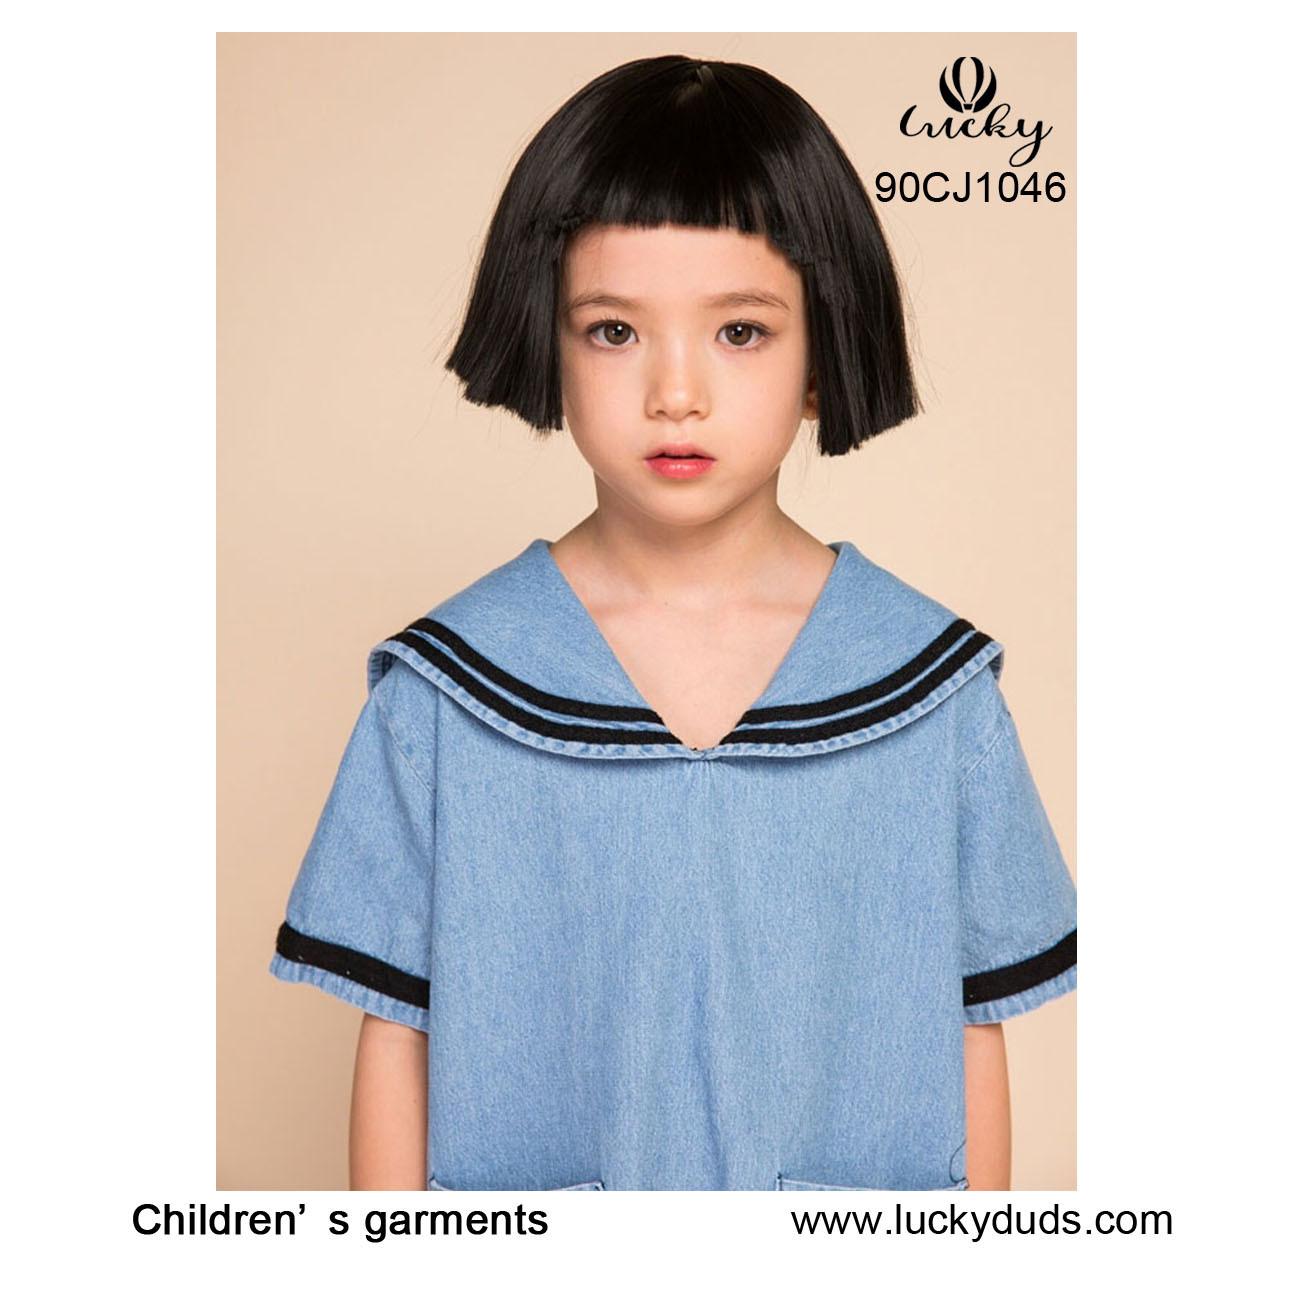 18032fbdd5 China New Design Baby 100% Cotton High Quality Garments Photos ...